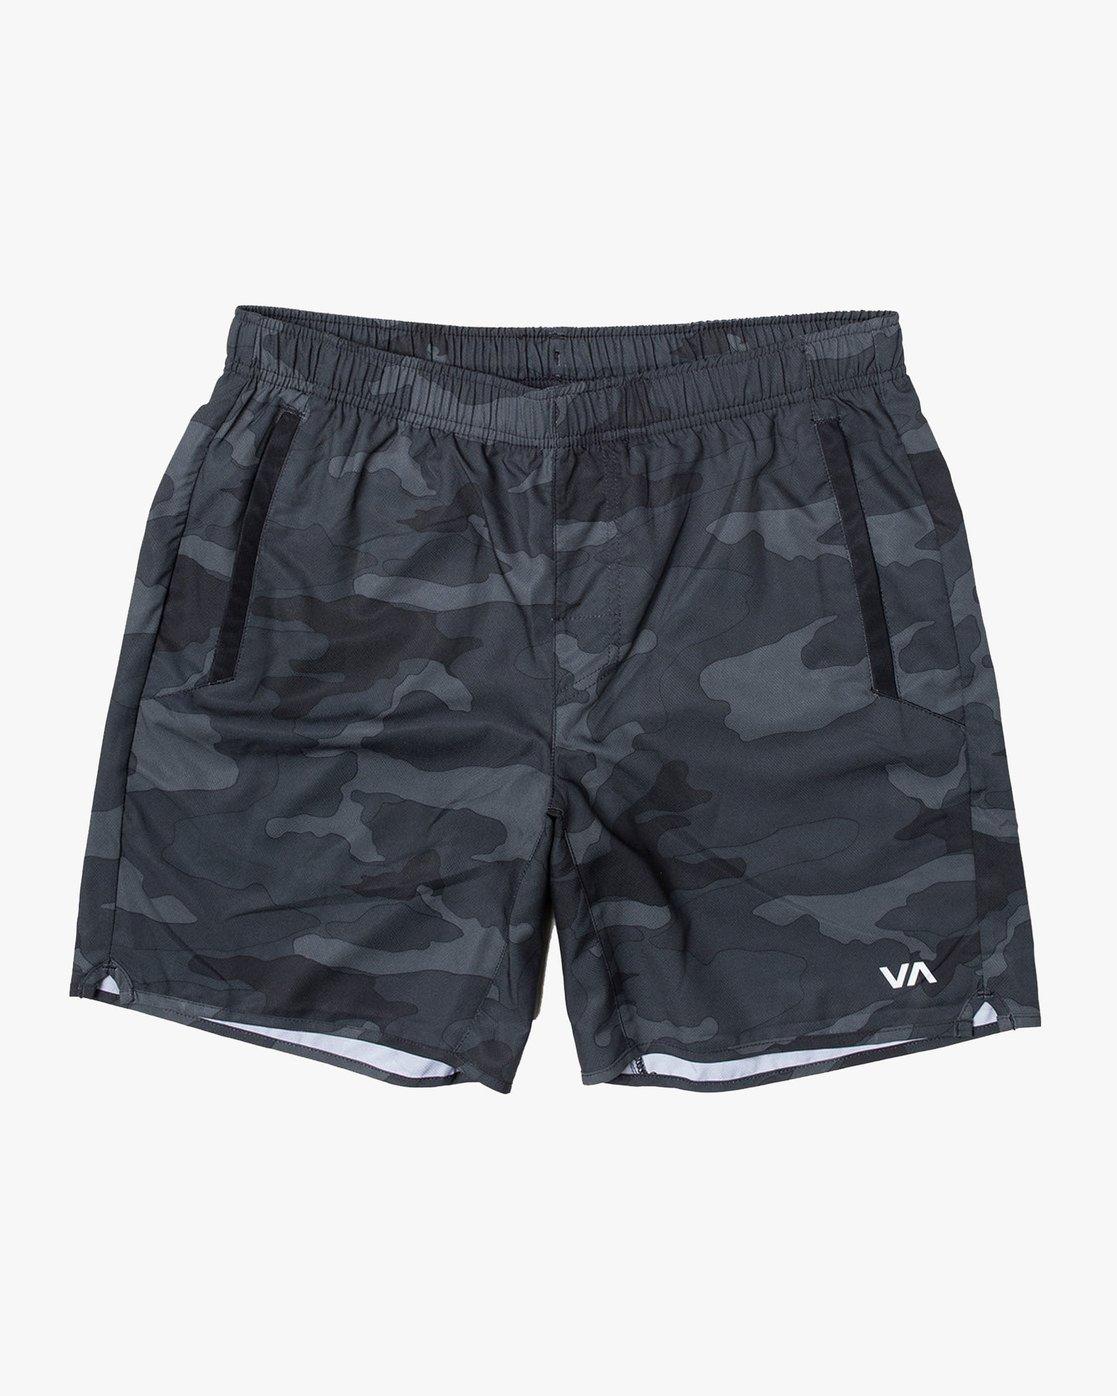 "0 Yogger IV 17"" - Workout Shorts for Men Camo W4WKMLRVP1 RVCA"